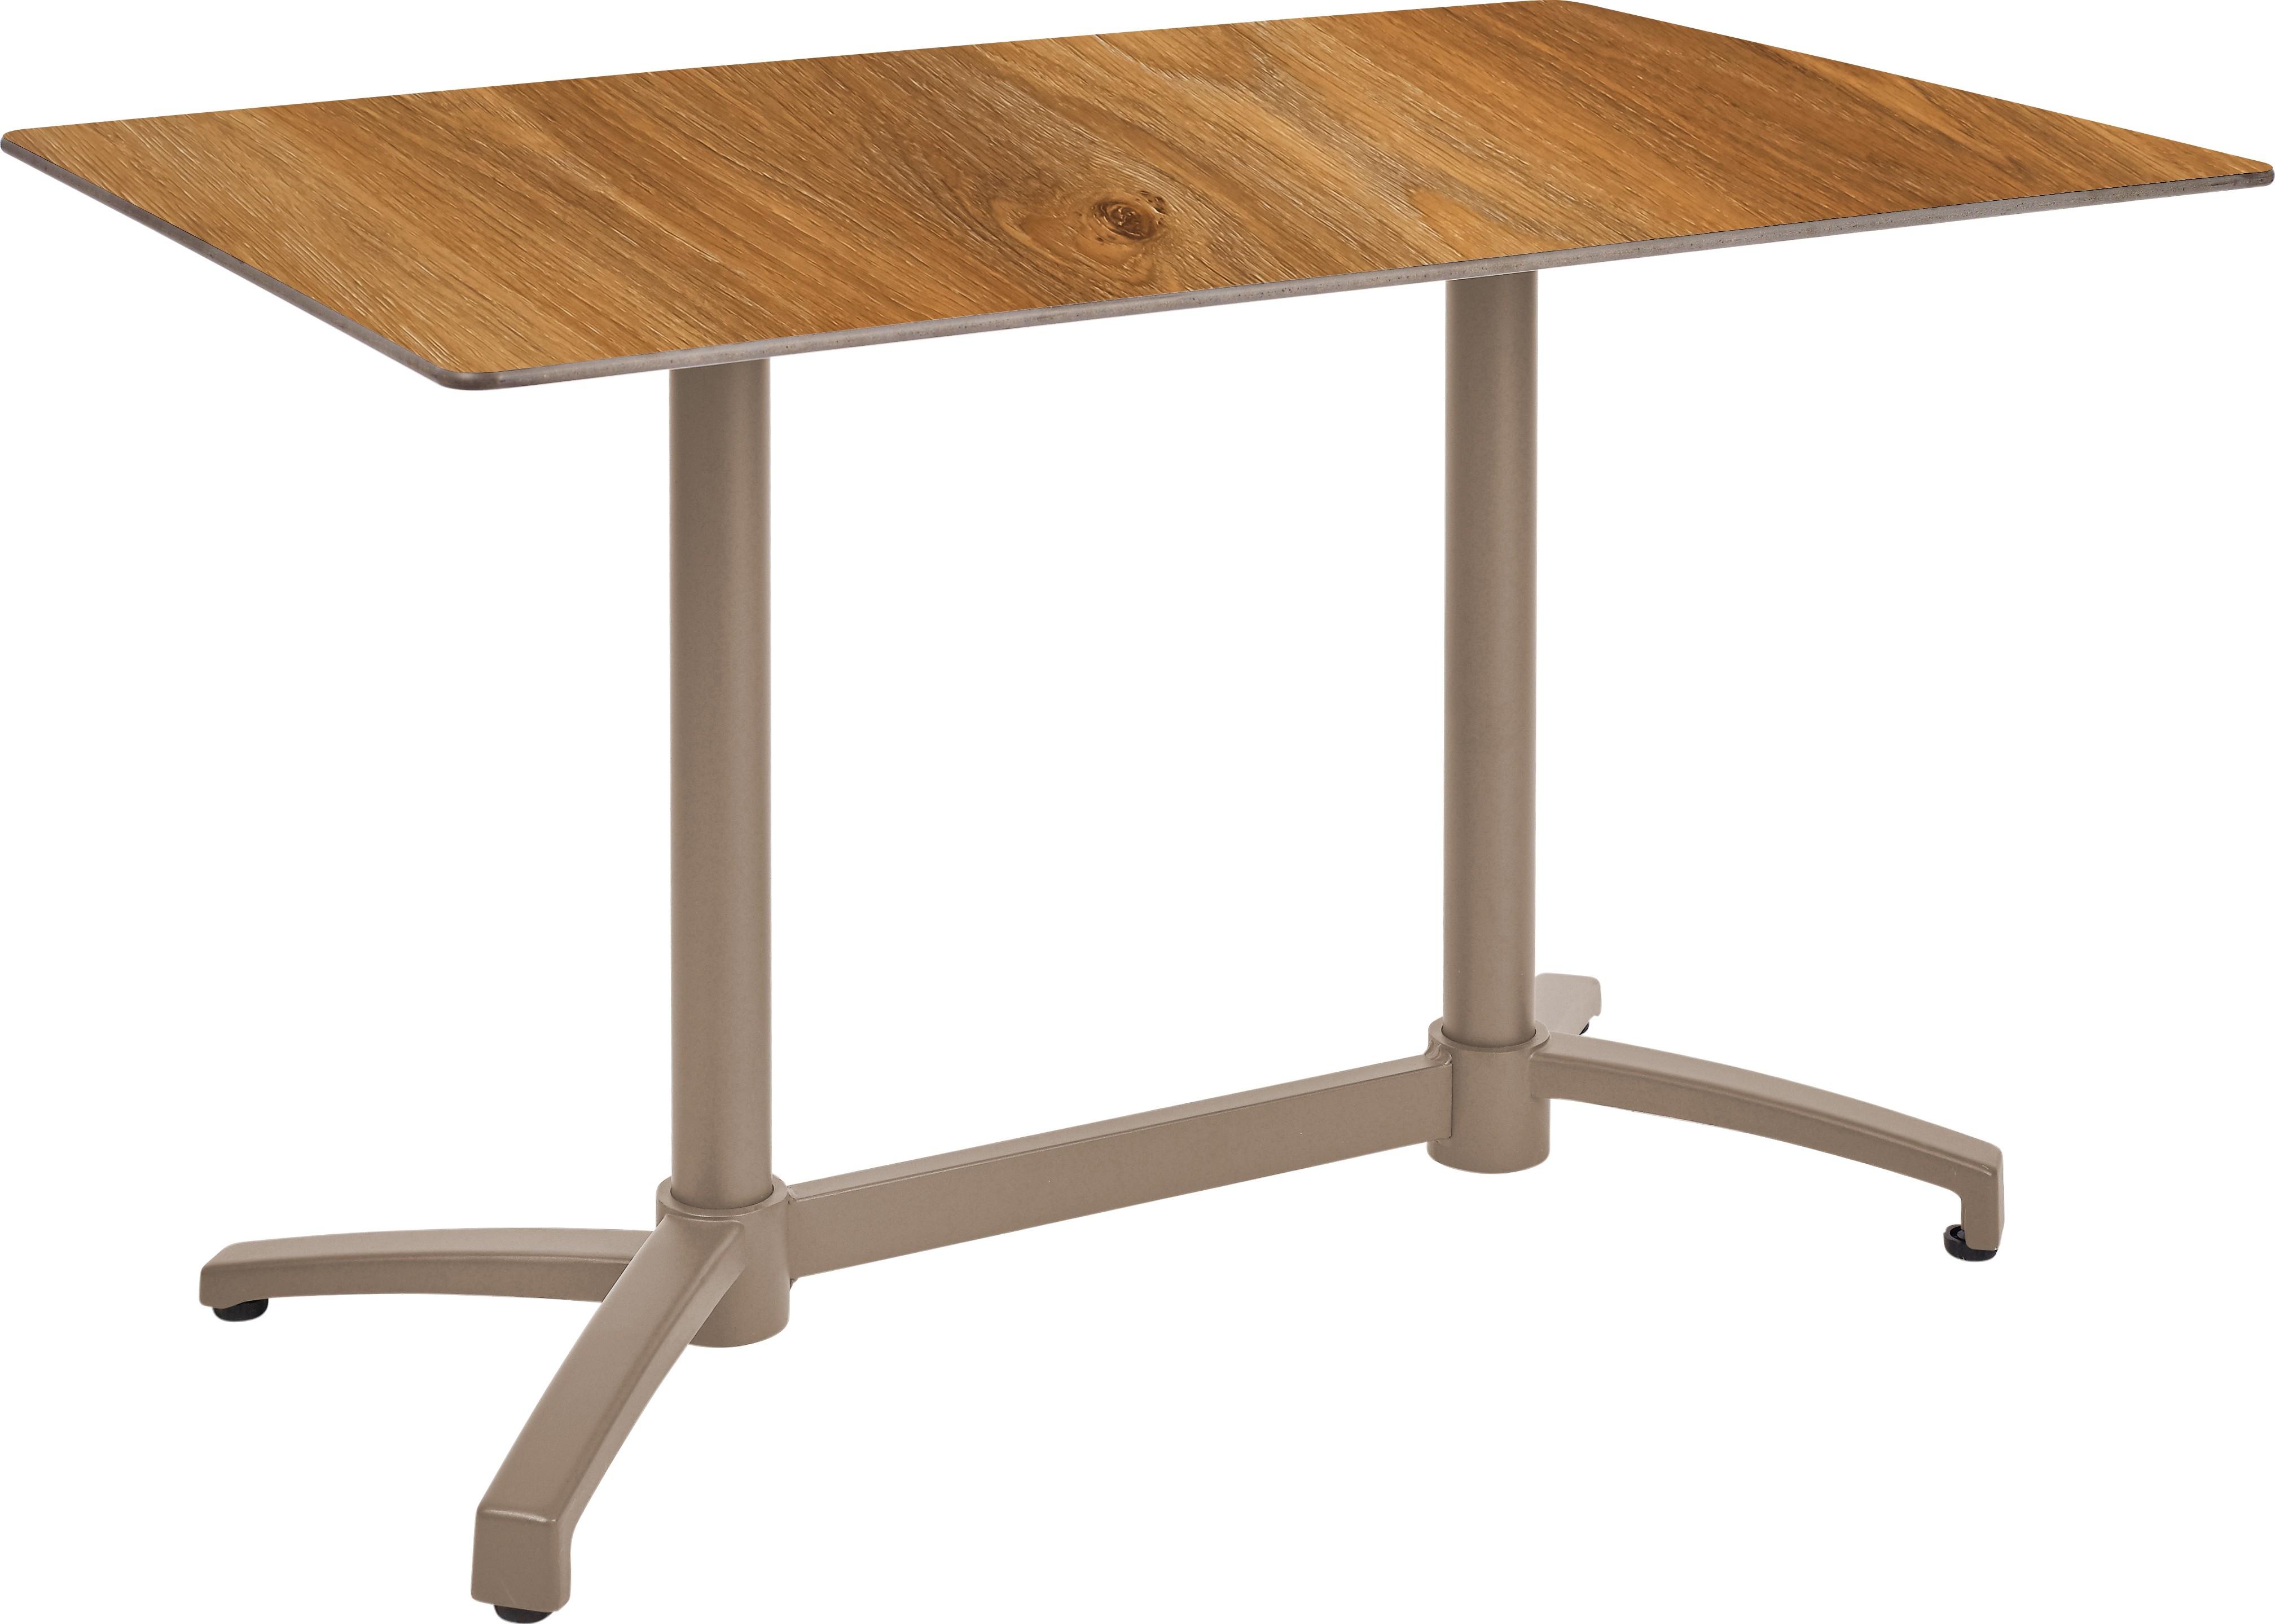 Mesa Ezpeleta abatible Taupe Marrones dark oak Aluminio lacado 120x80